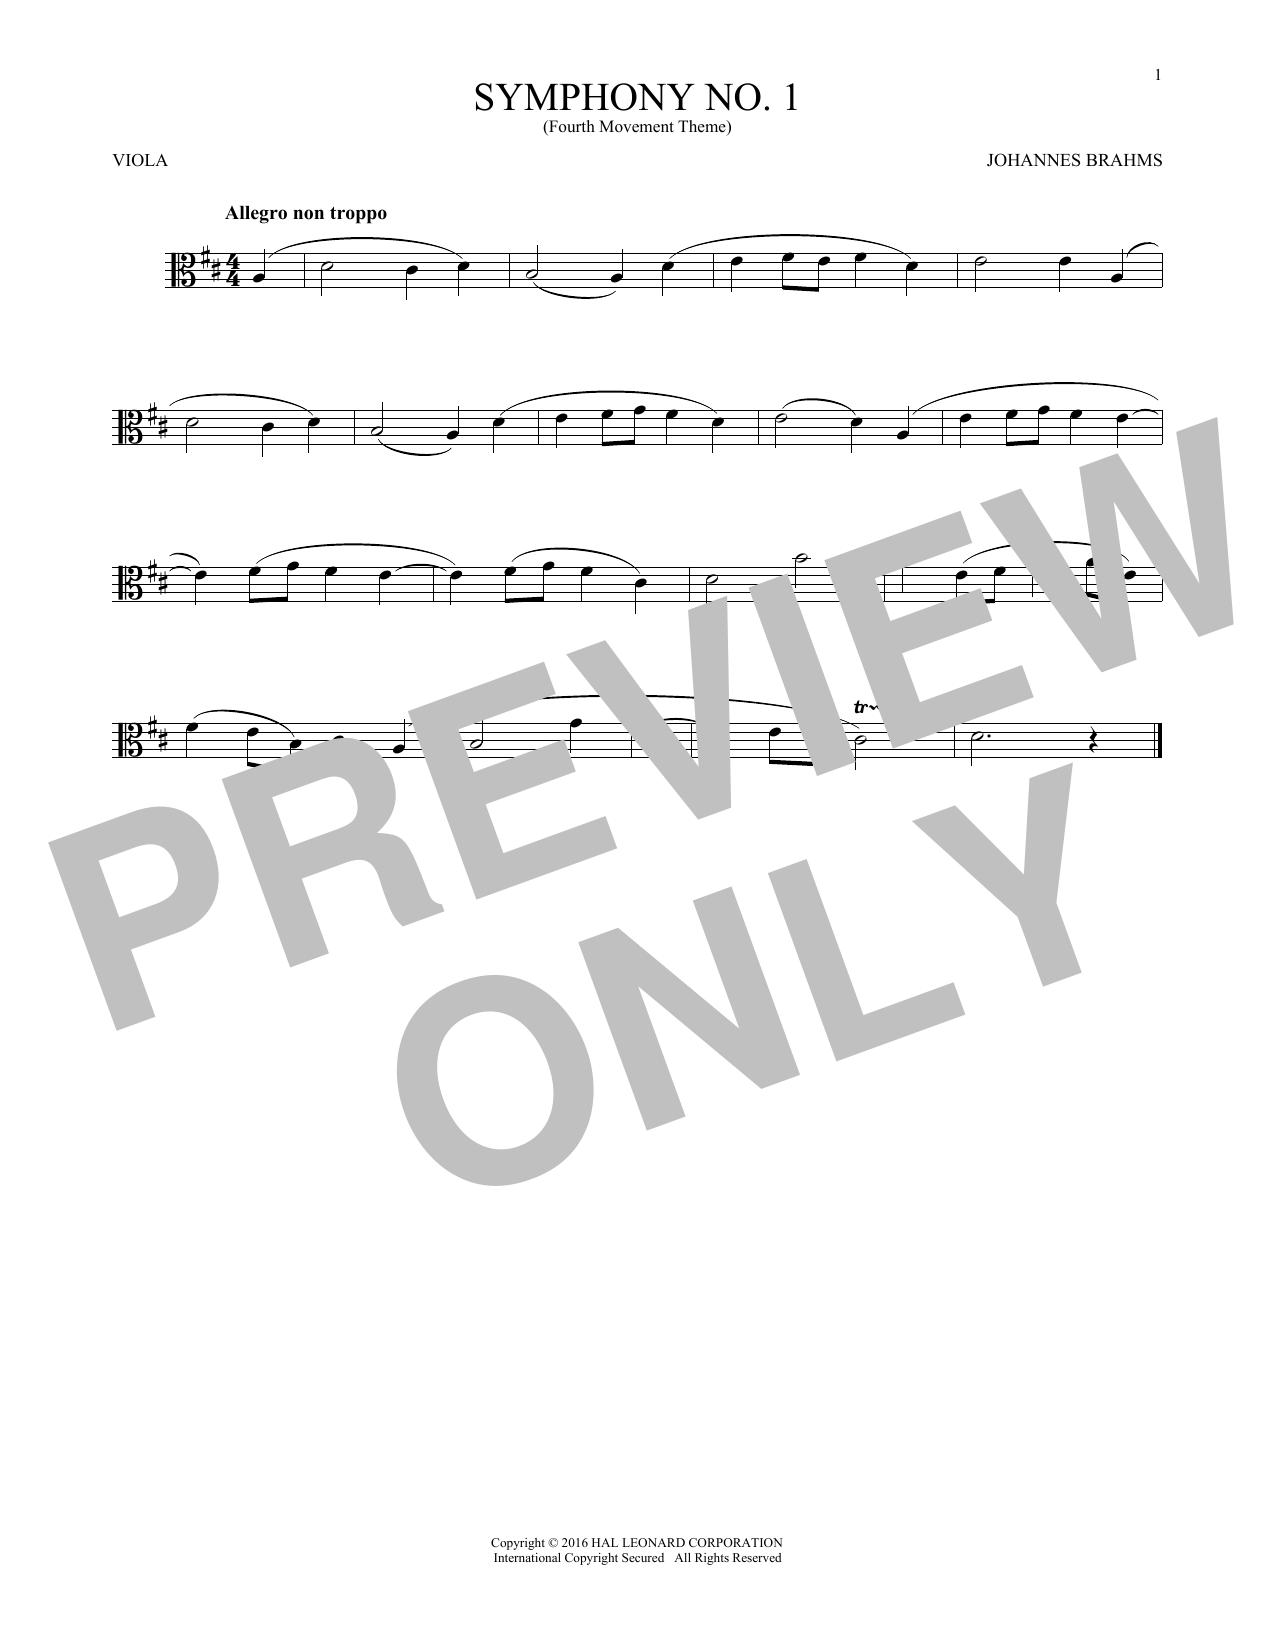 Symphony No. 1 In C Minor, Fourth Movement Excerpt (Viola Solo)